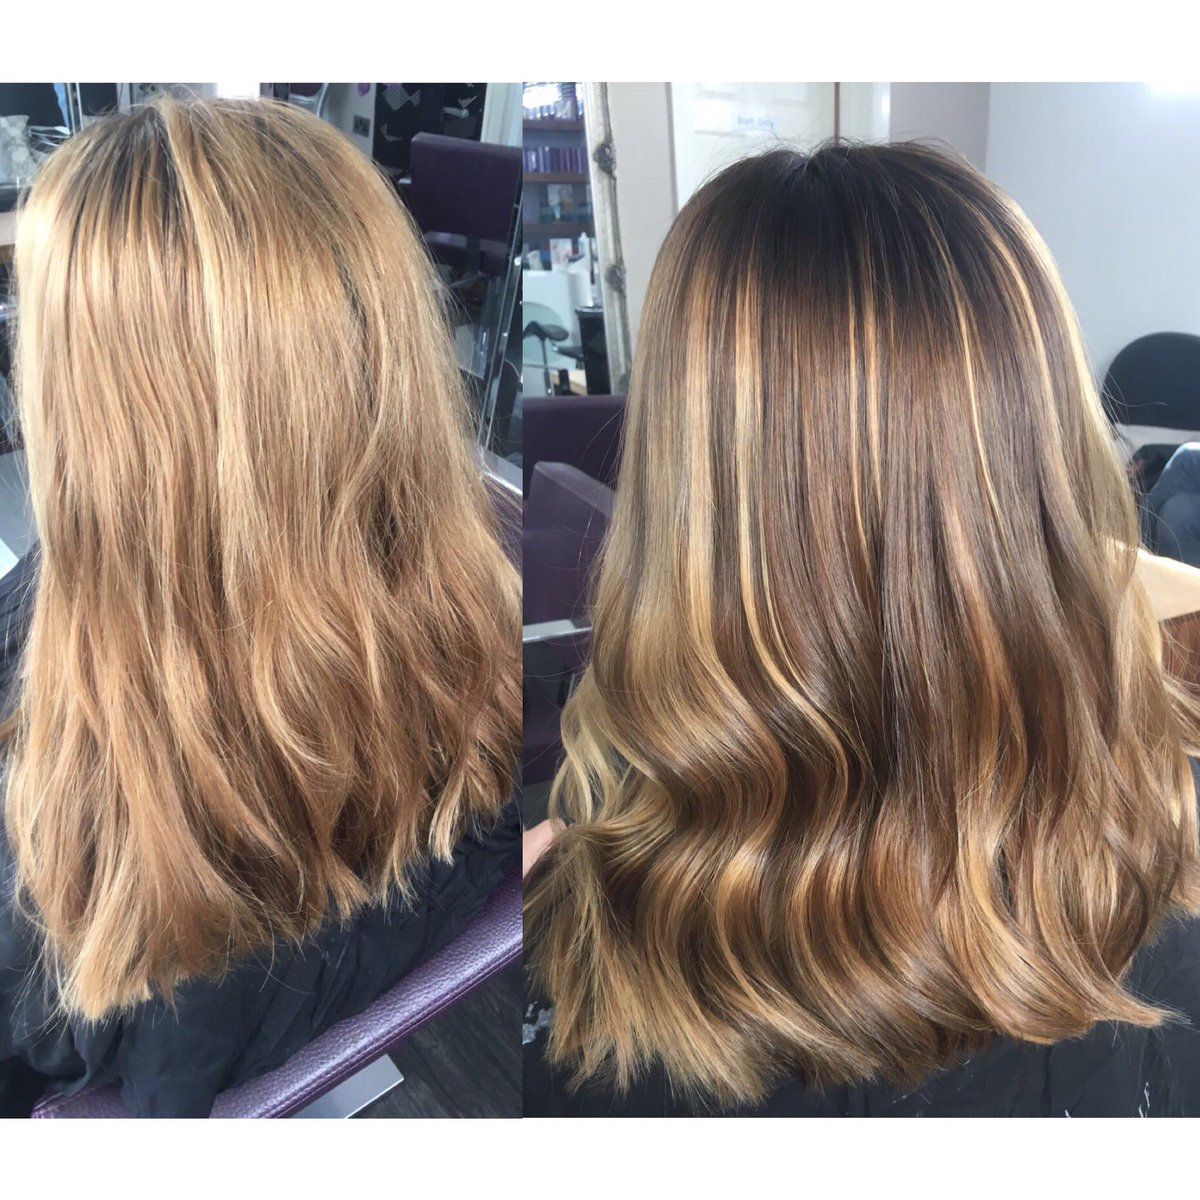 Hair By Diamond Love Nj Avantidayresort Haircut Makeover